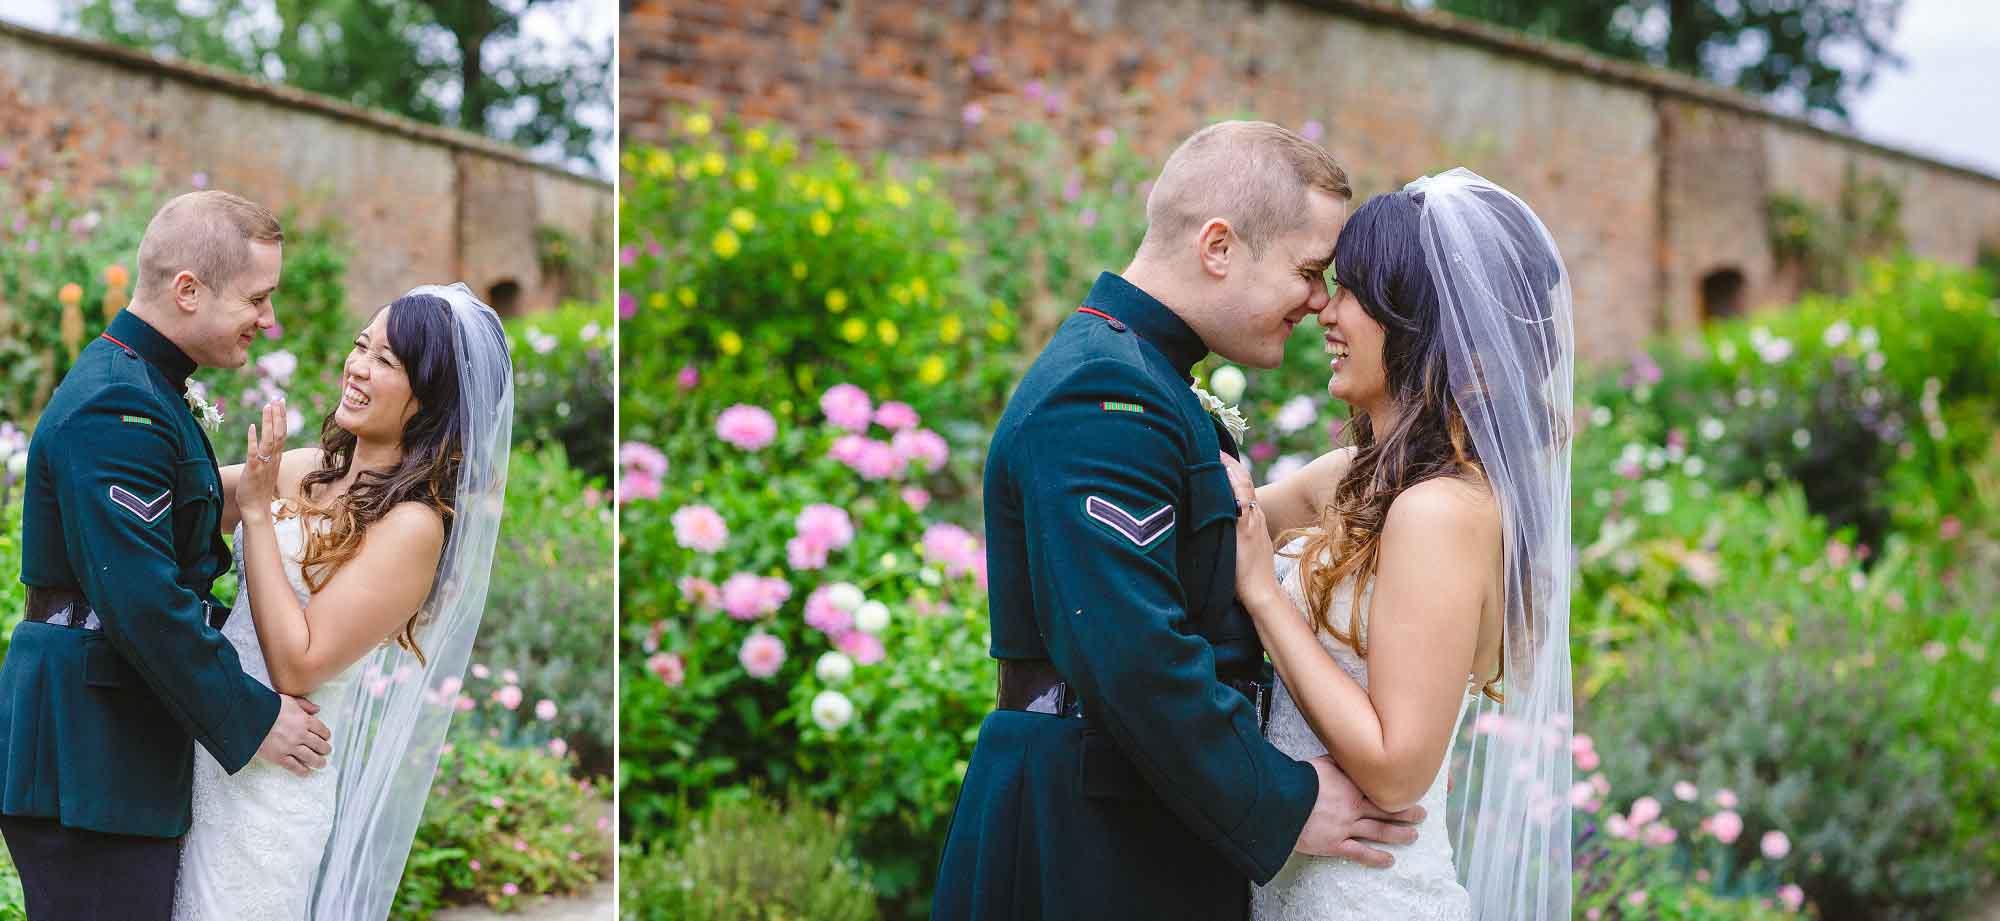 Blake-Hall-Wedding-Photographer_0083.jpg